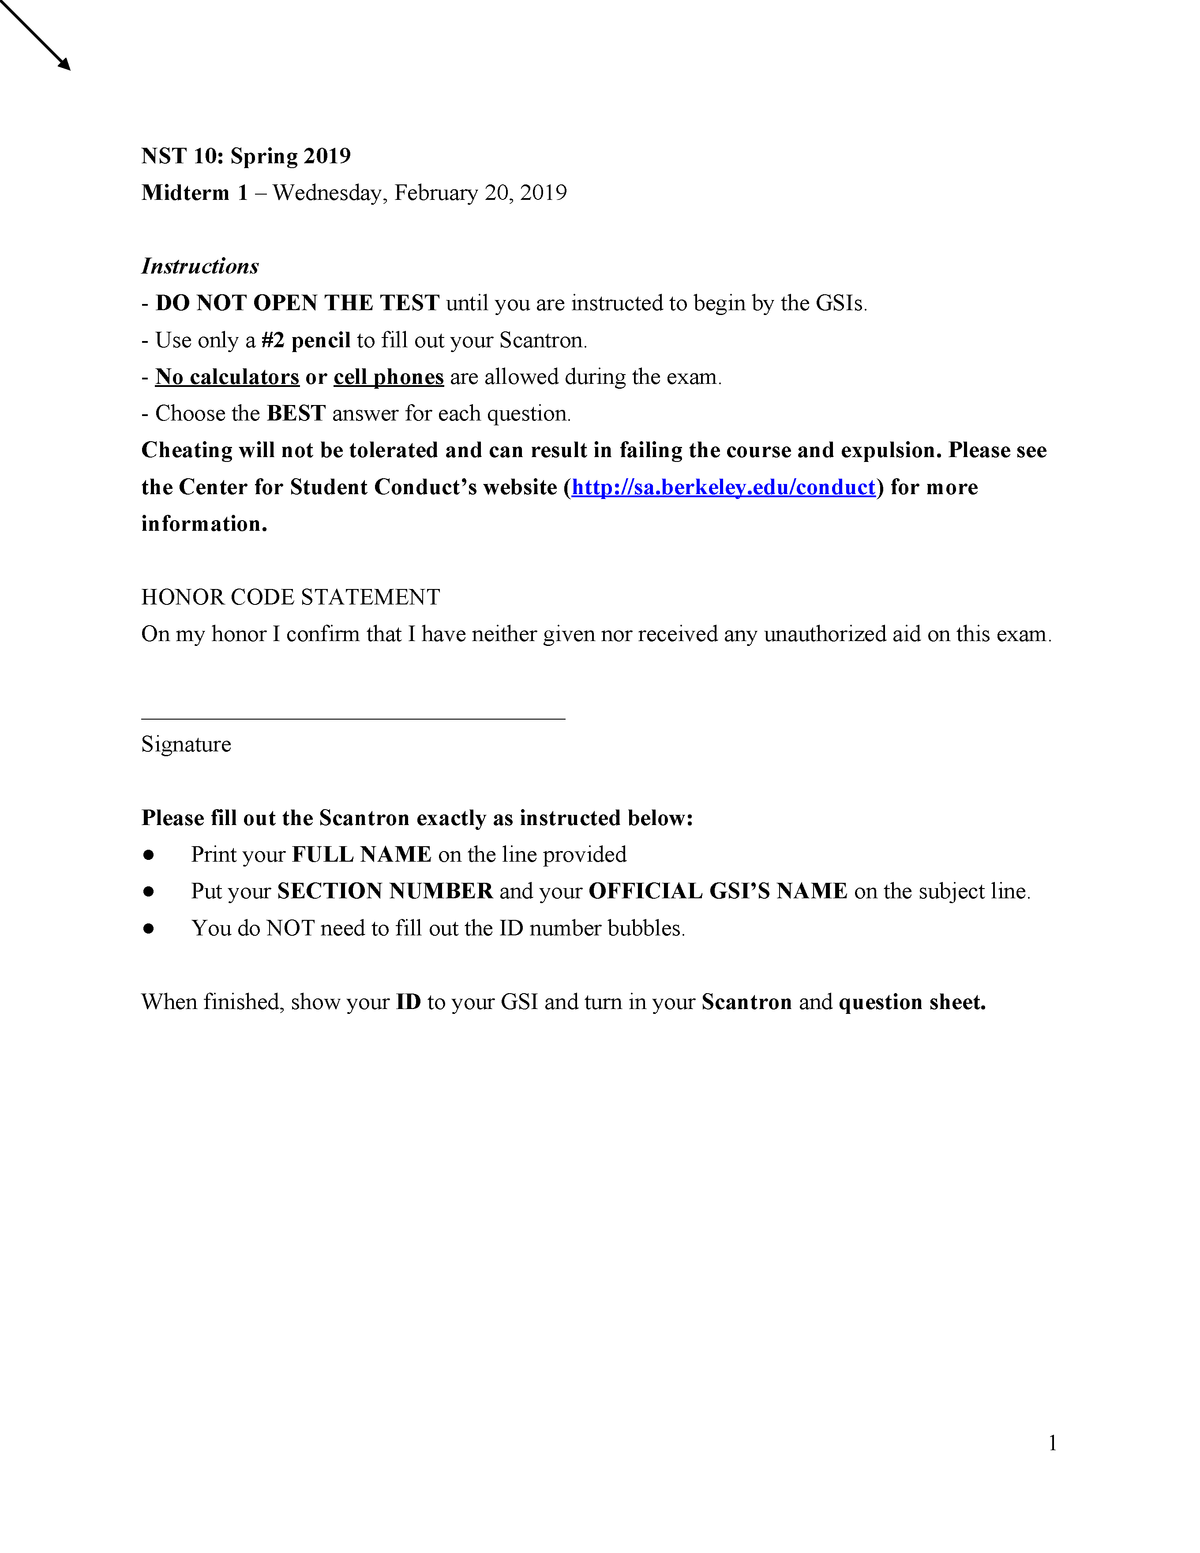 Exam 2019 - NUSCTX 10: Introduction To Human Nutrition - StuDocu